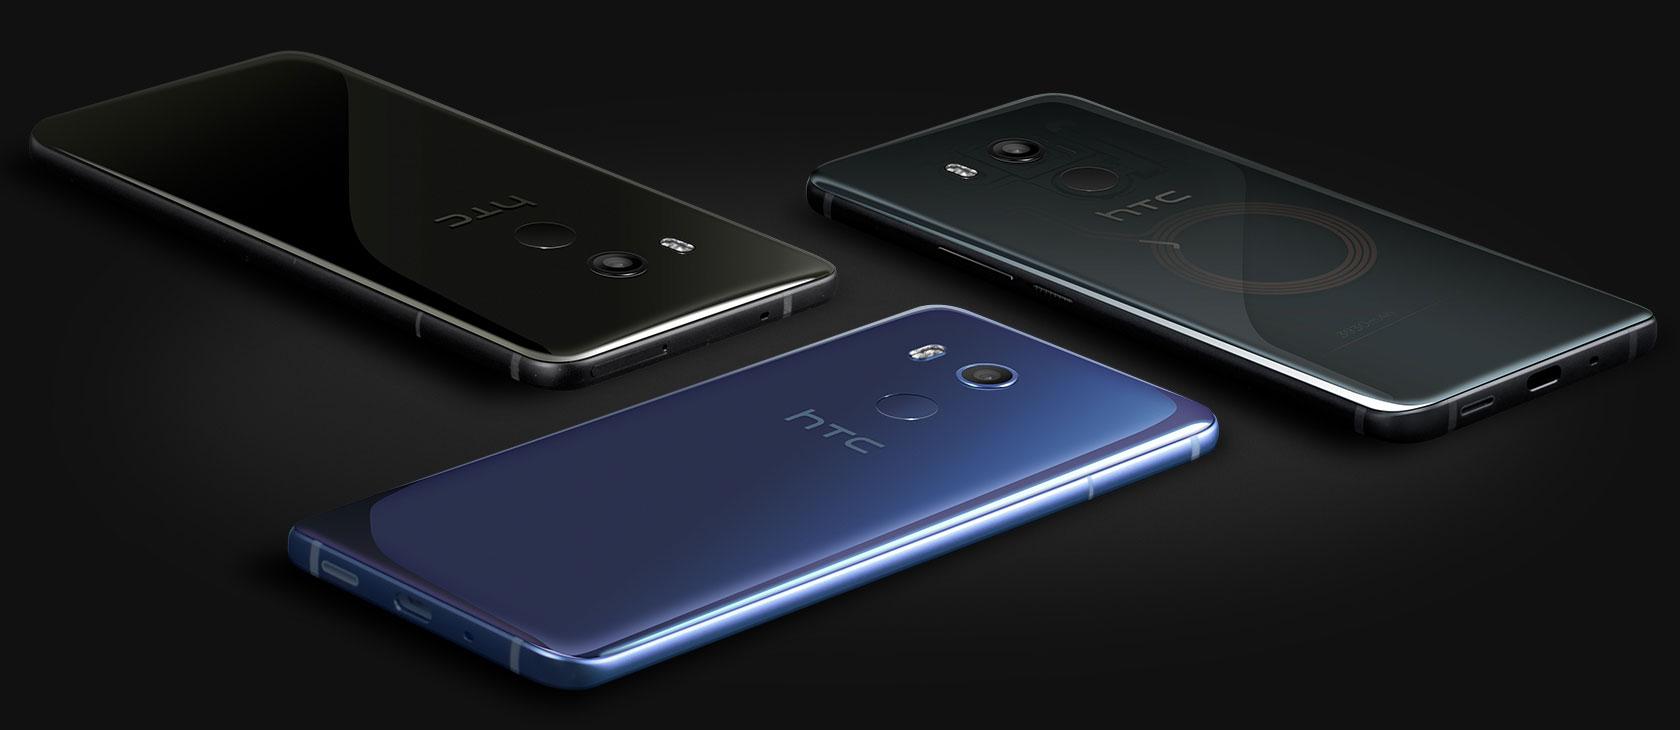 اچ تی سی یو 11+ (HTC U11+)